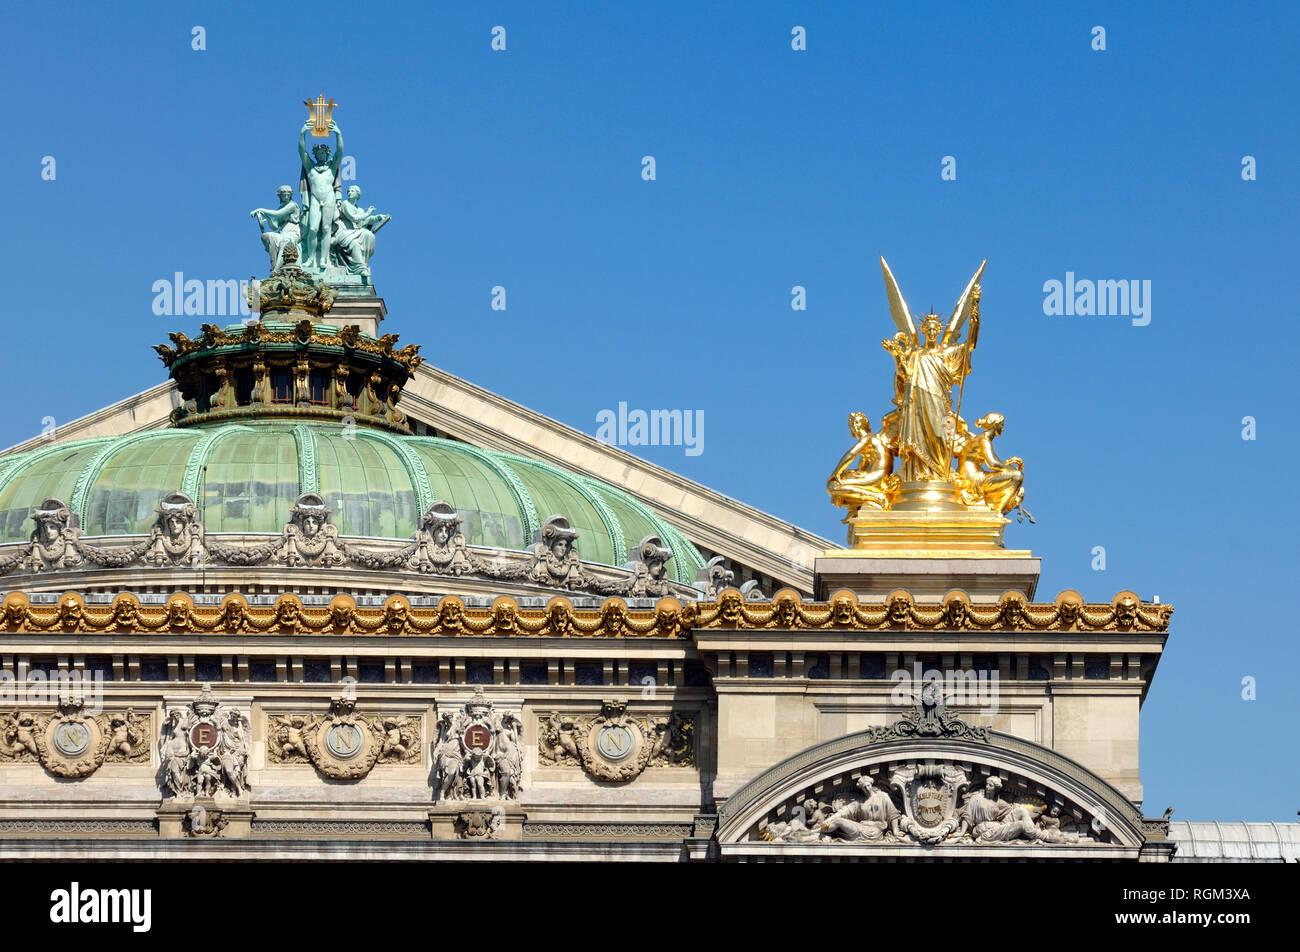 Baroque Roof Detail or Opera Garnier (1861-75) aka Palais Garnier, Paris Opera or Paris Opera House Paris France - Stock Image